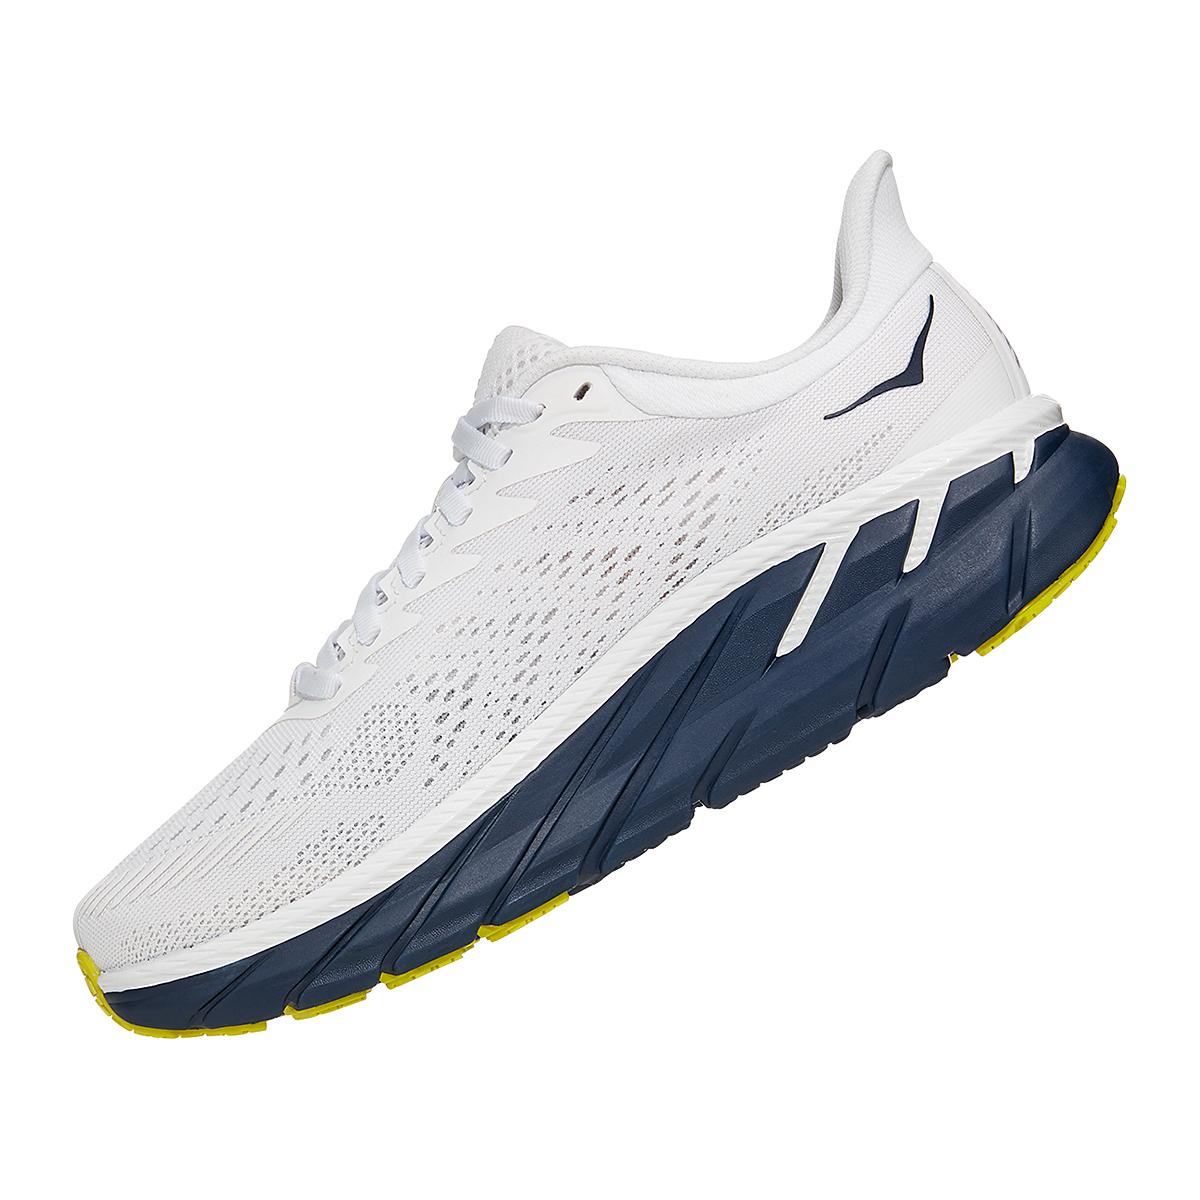 Women's Hoka One One Clifton 7 Running Shoe - Color: Blanc De Blanc - Size: 5 - Width: Regular, Blanc De Blanc, large, image 2